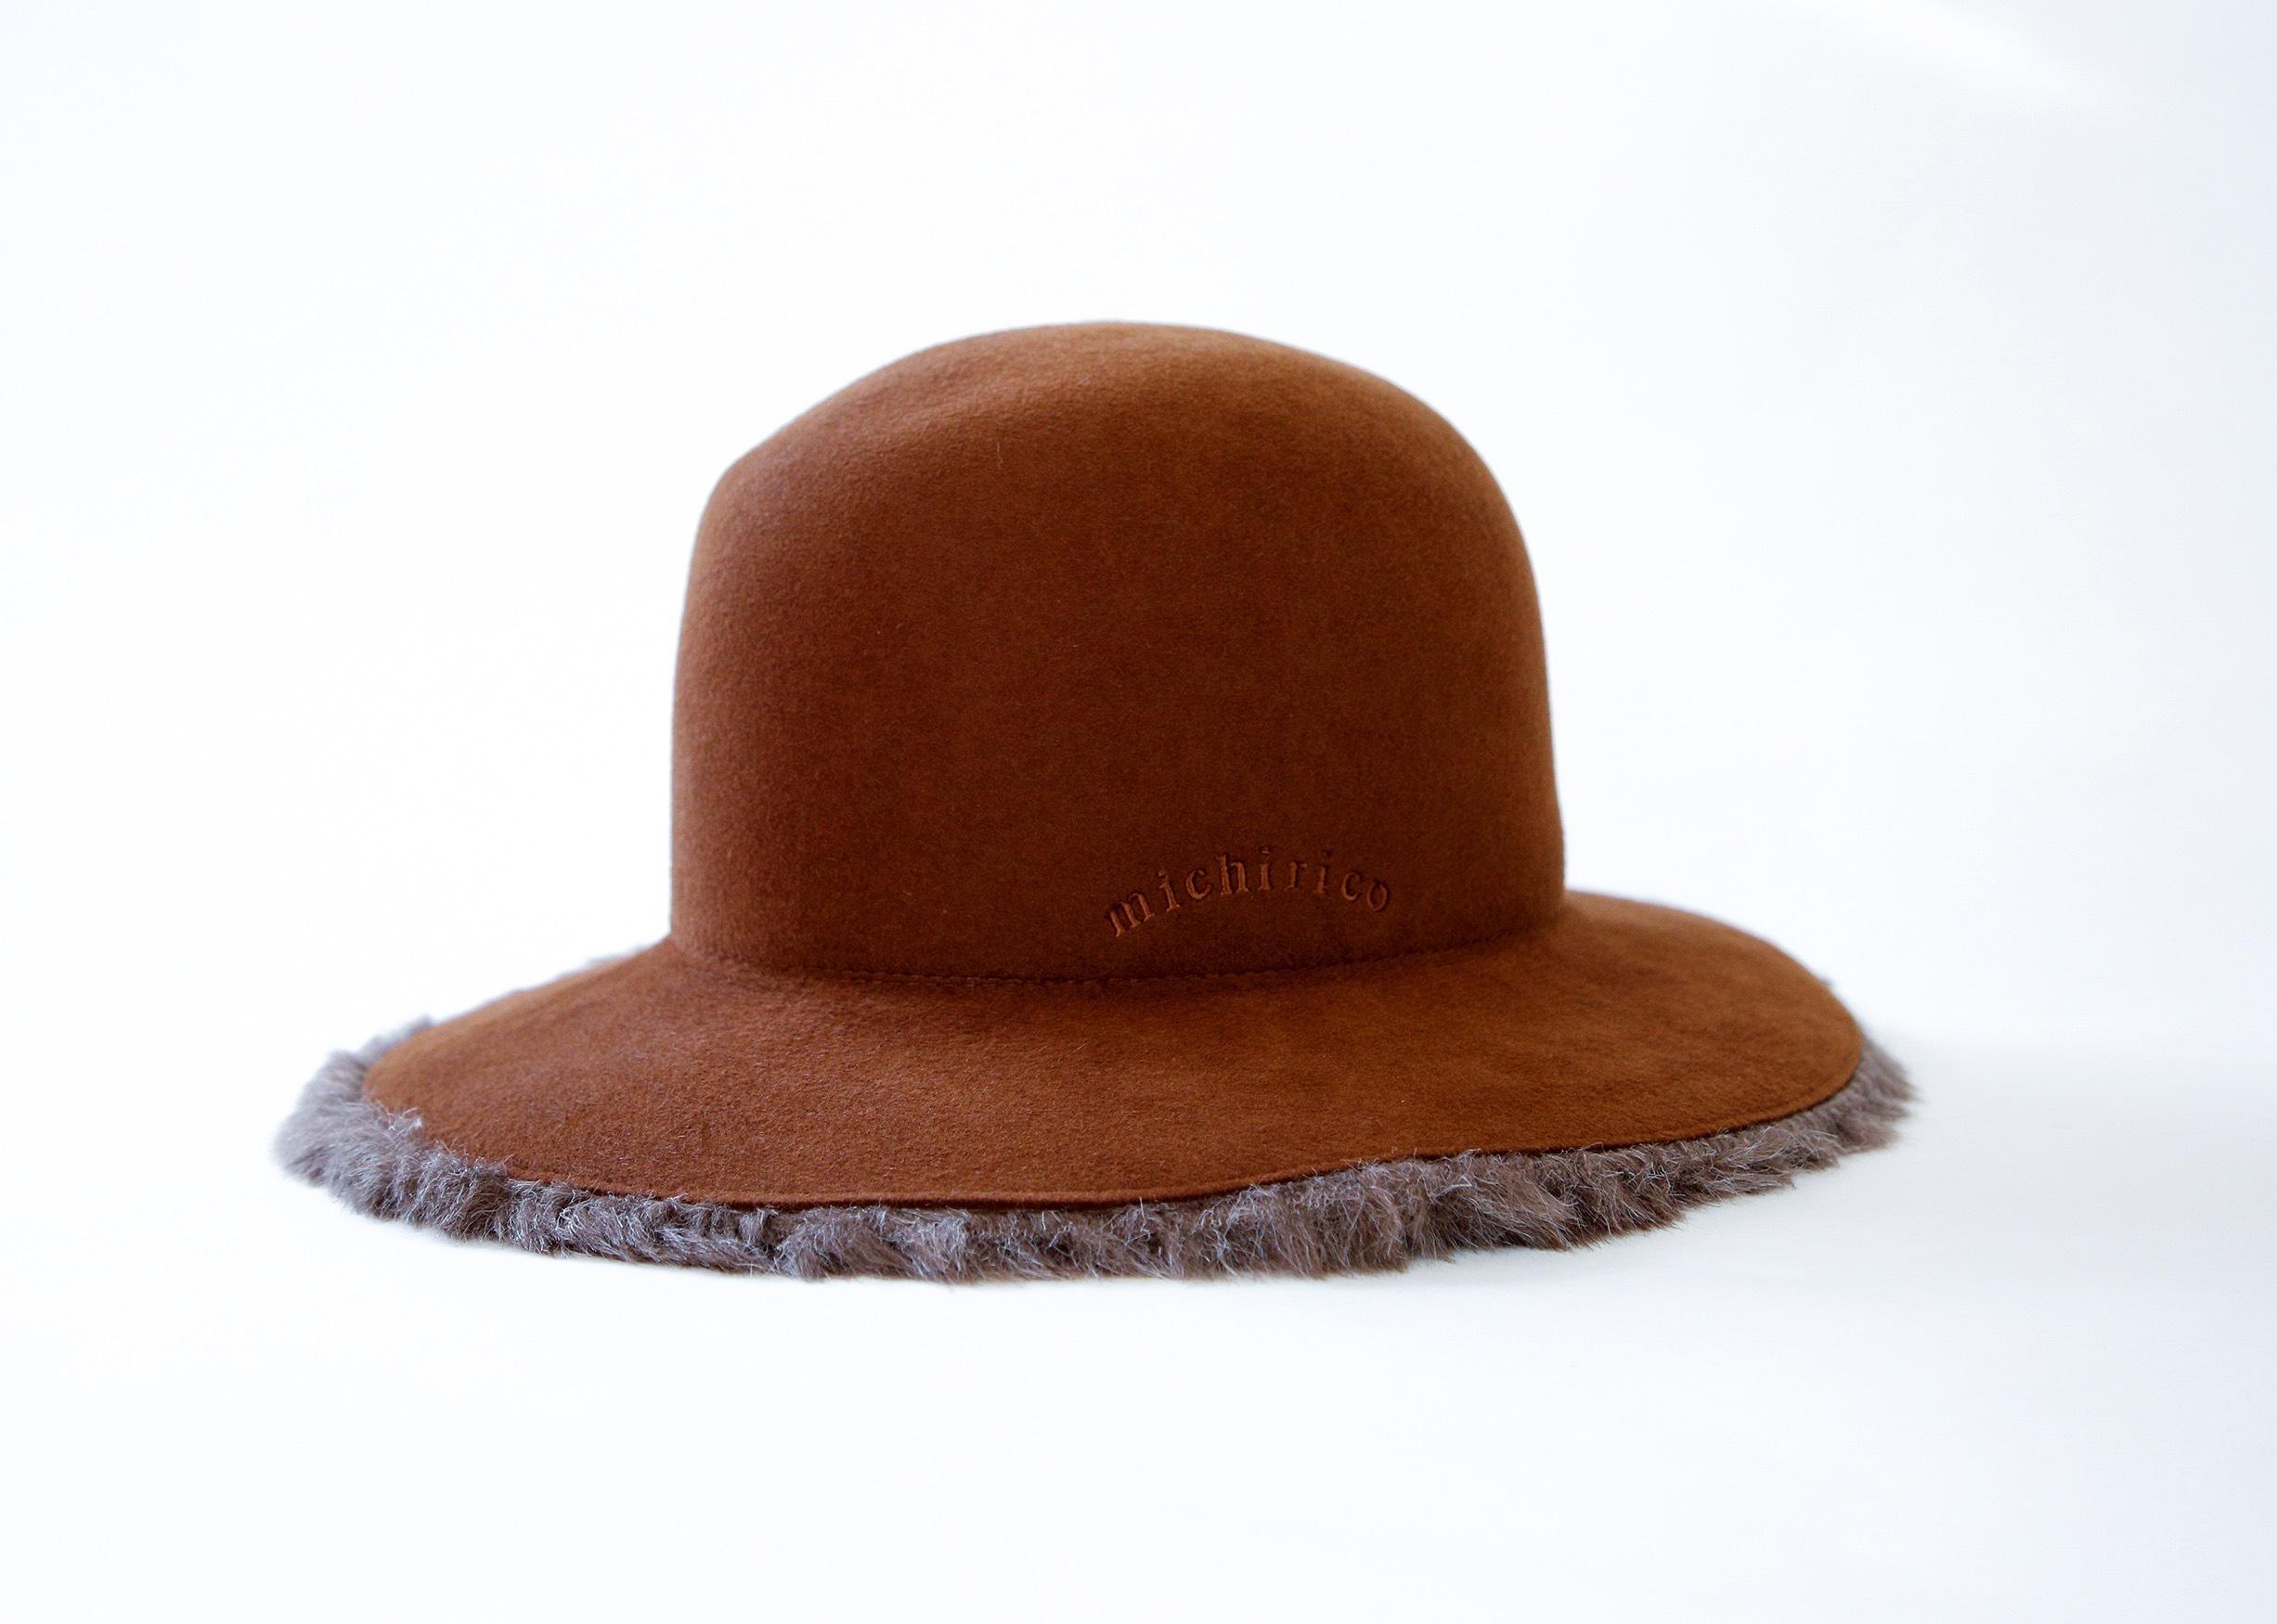 《michirico 2020AW》Antelope hat / camel / F(womens)